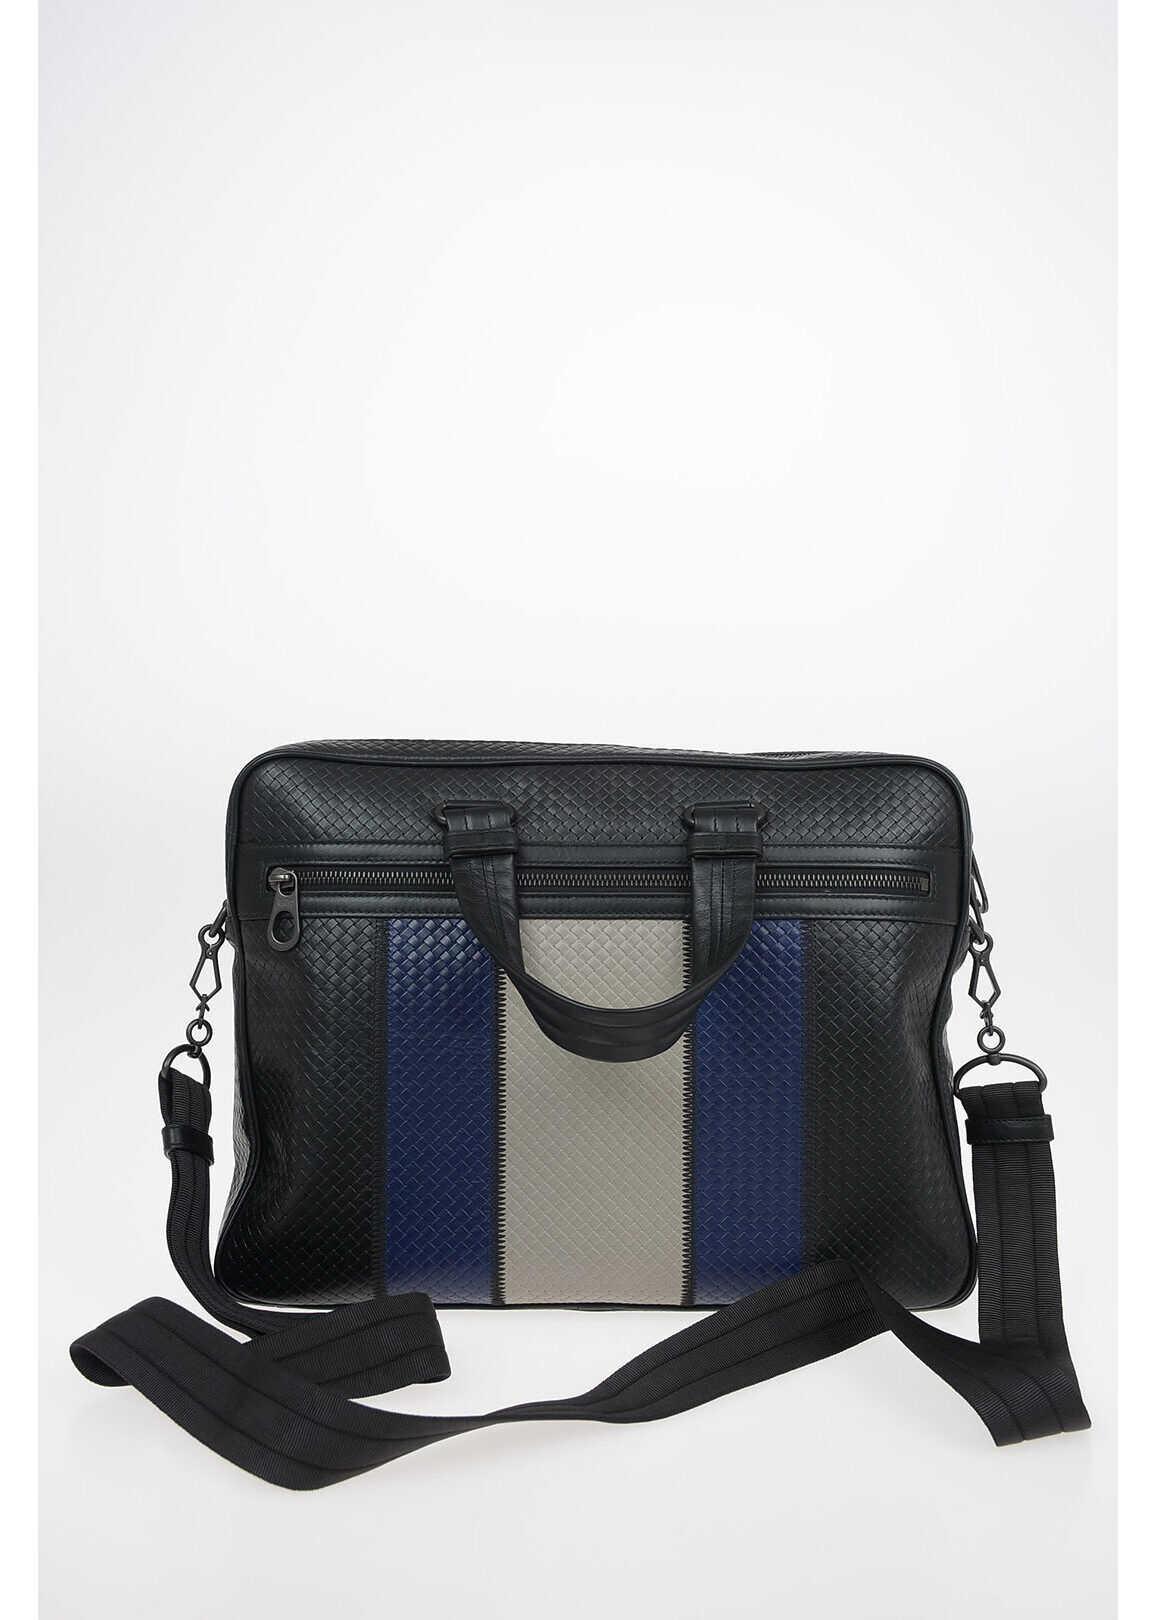 Bottega Veneta Braided Leather Business bag BLACK imagine b-mall.ro